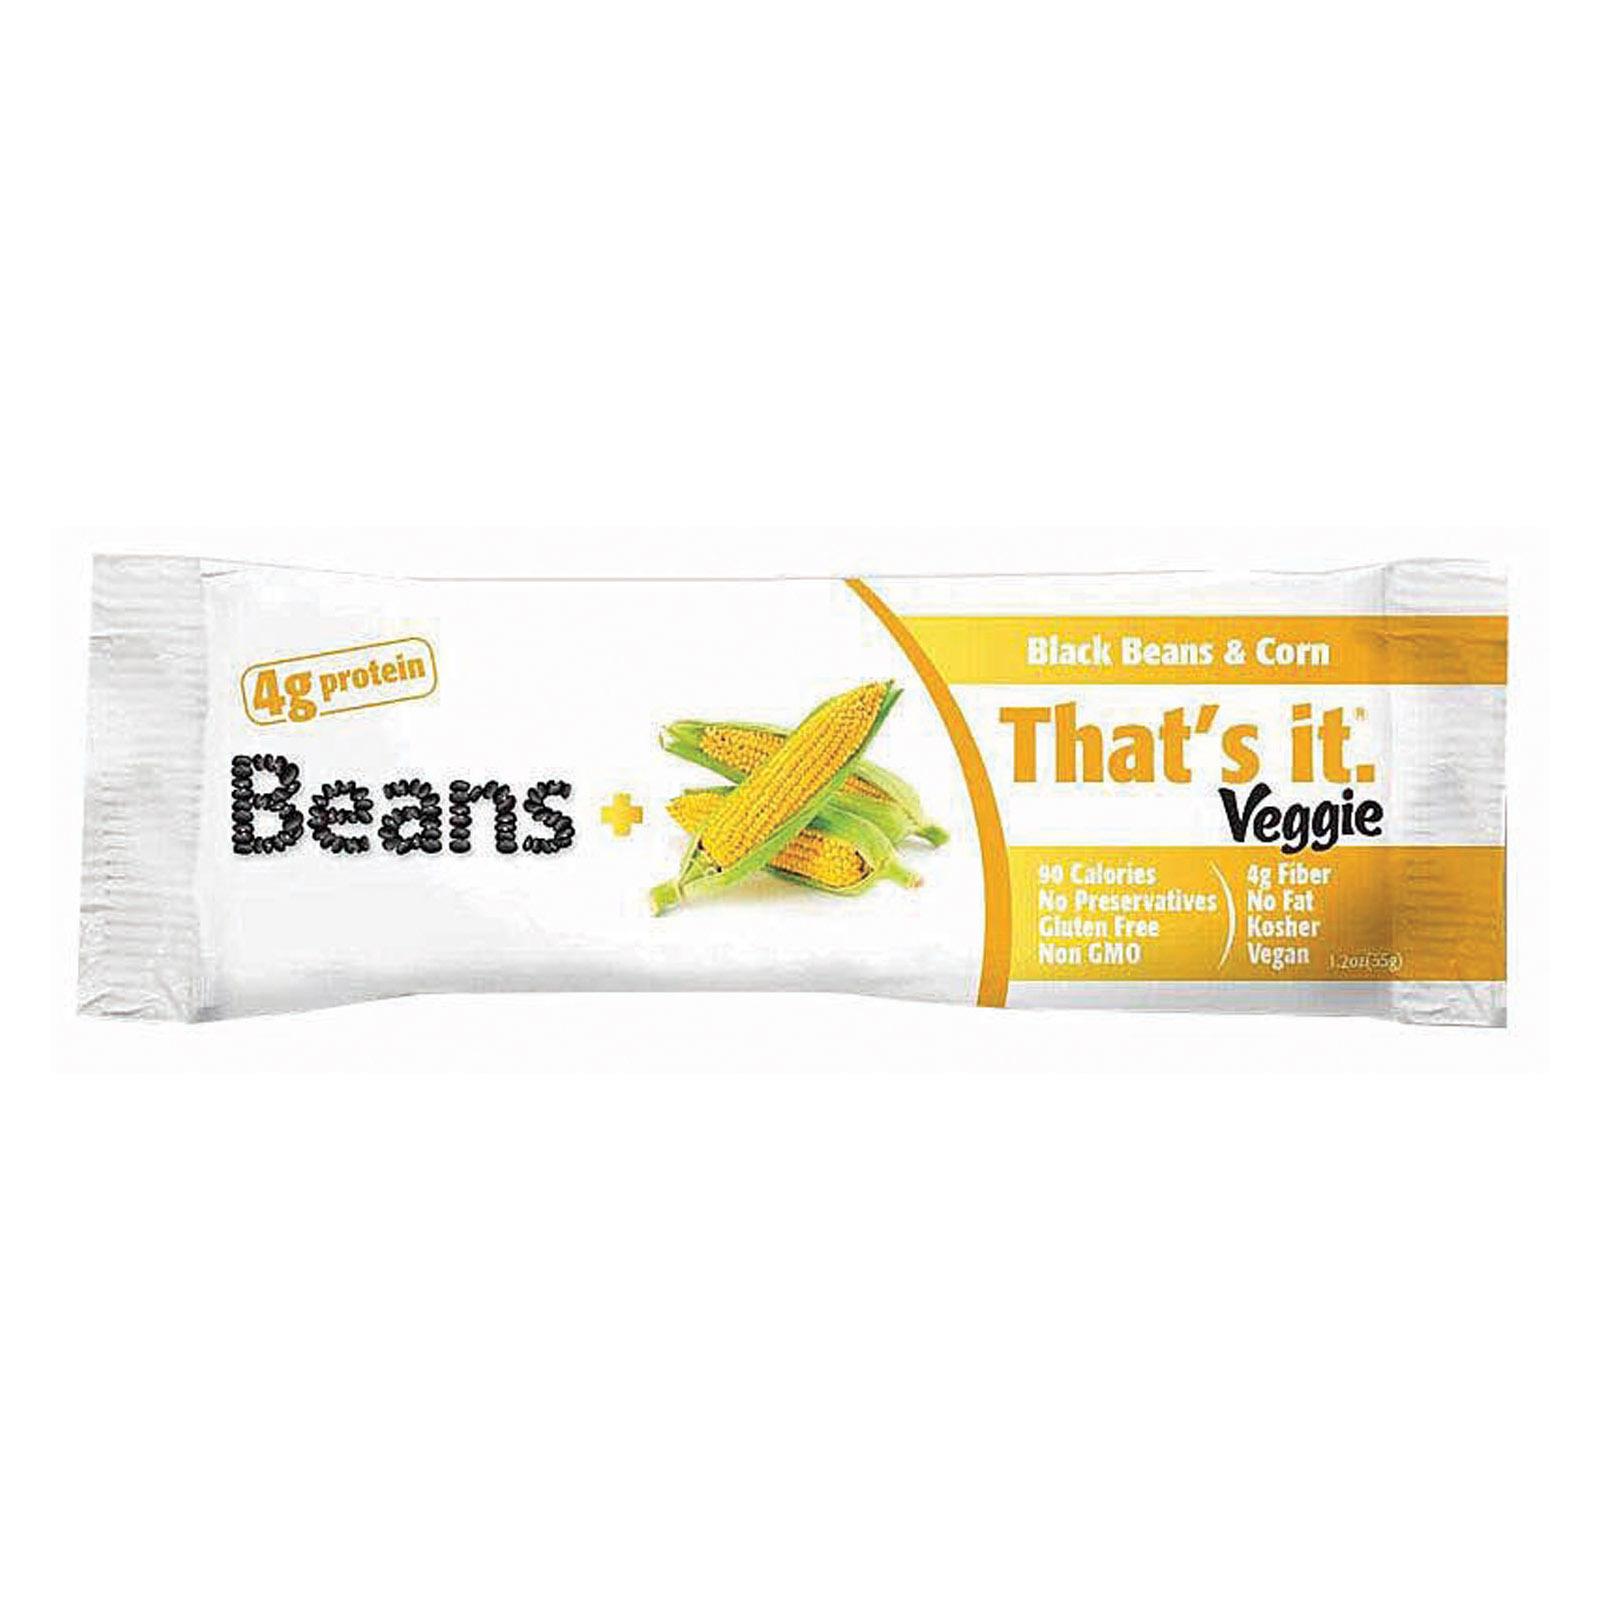 That's It Veggie Bar - Black Bean and Corn - Case of 12 - 1.2 oz